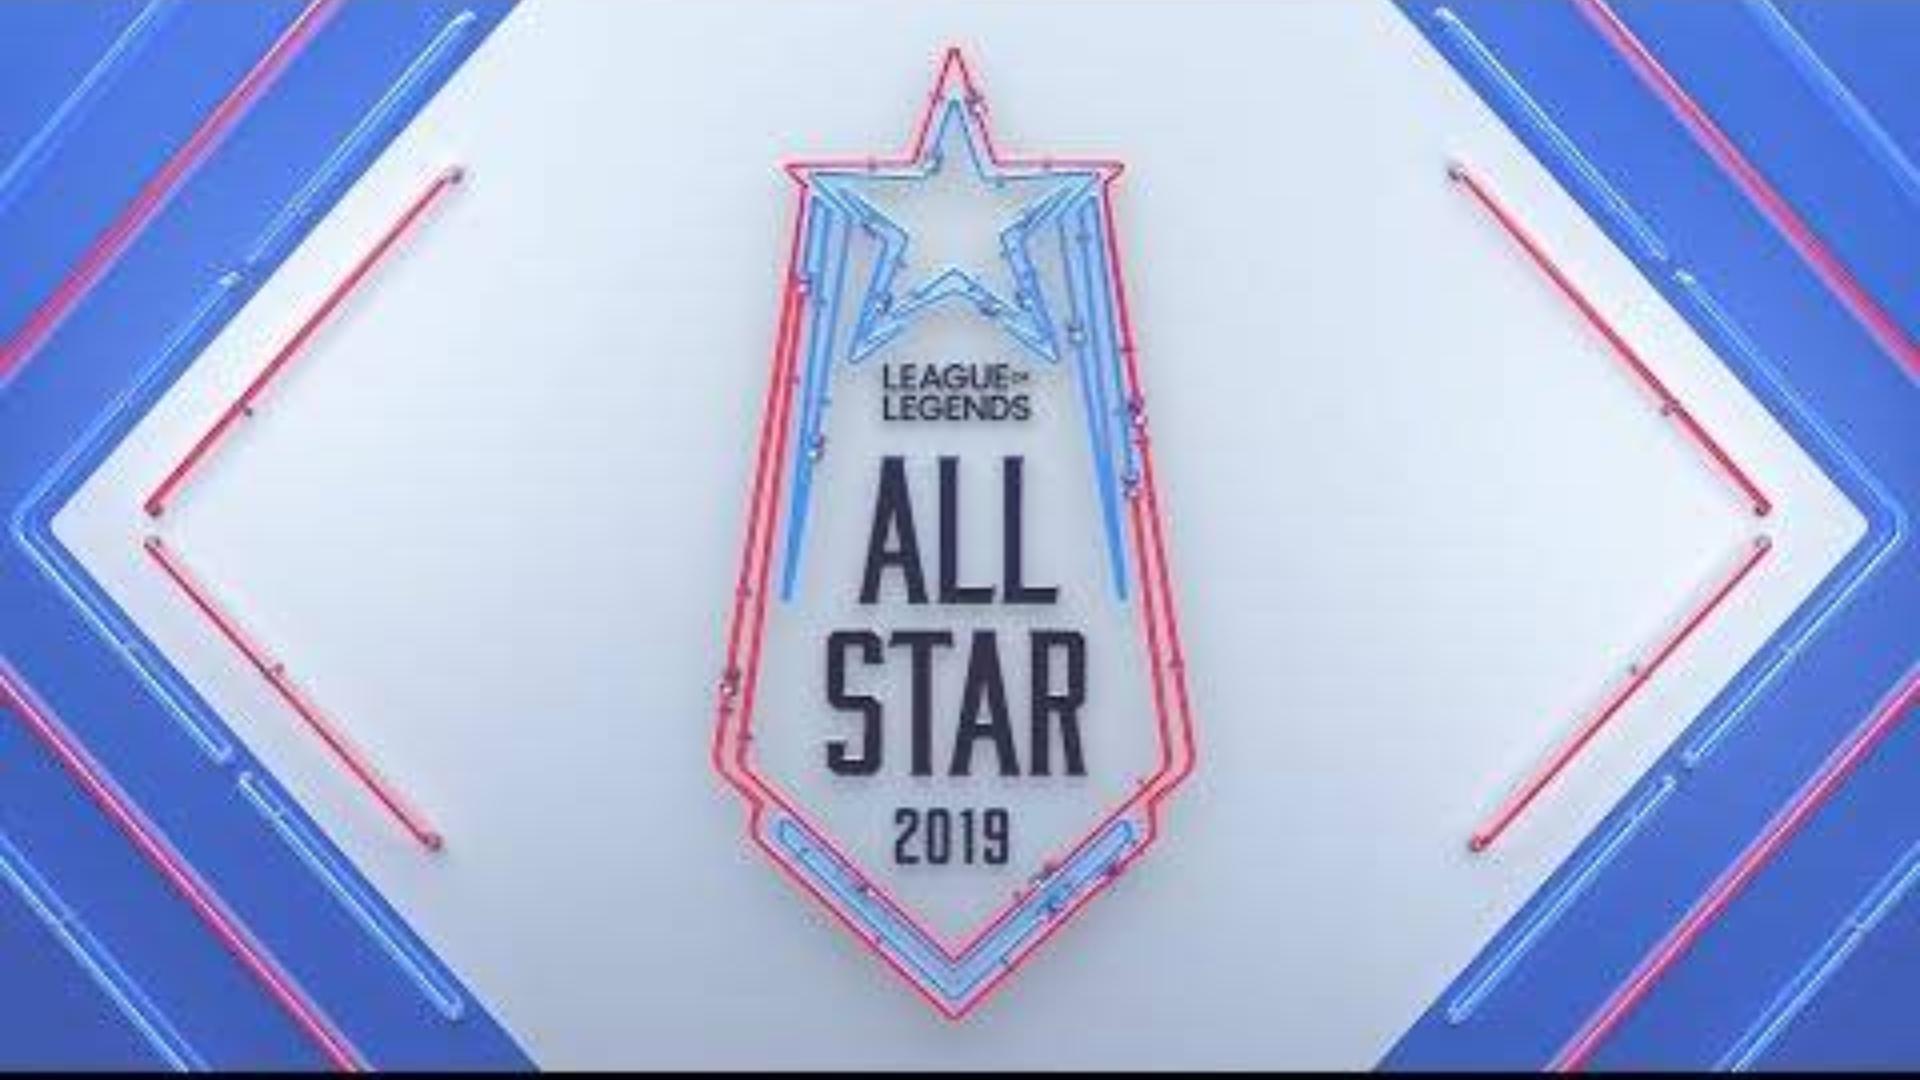 快速看完2019Allstar全明星赛 Day3